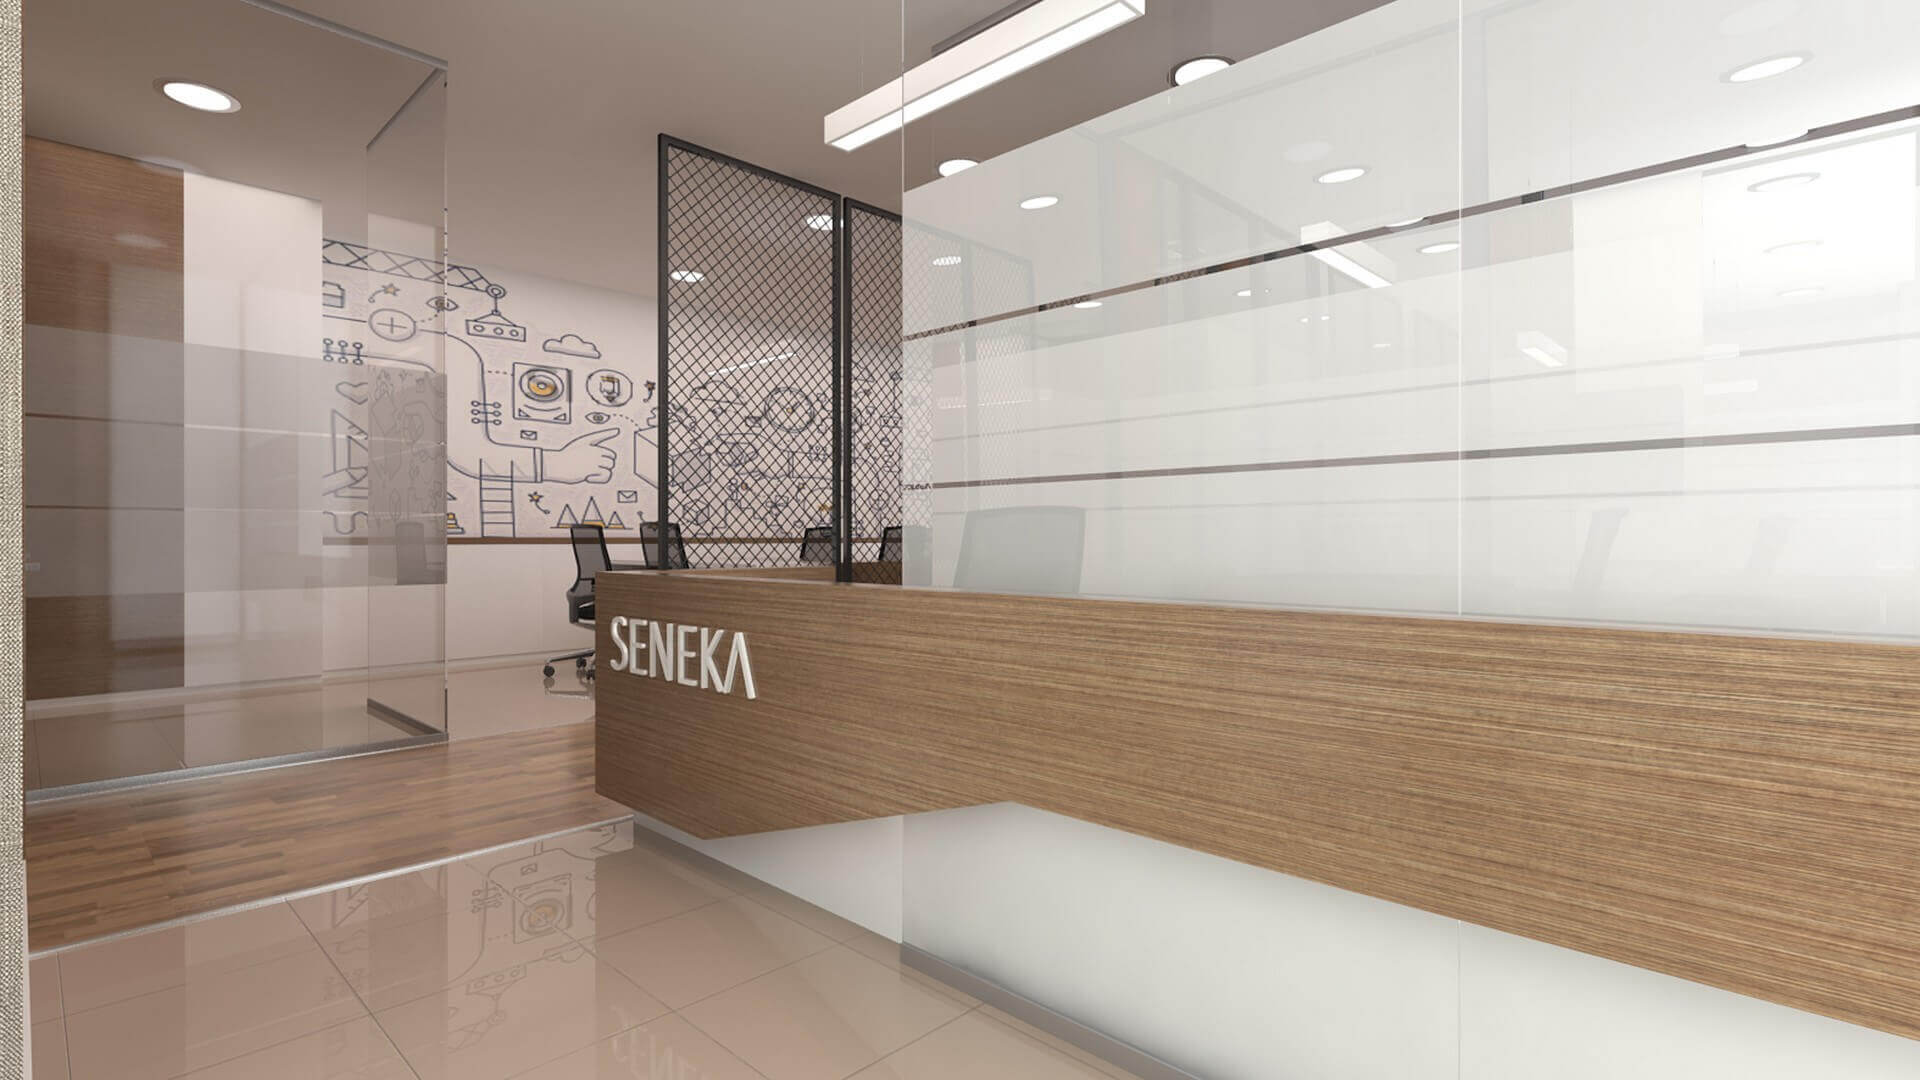 Cyberpark 2693 Seneka Software Offices